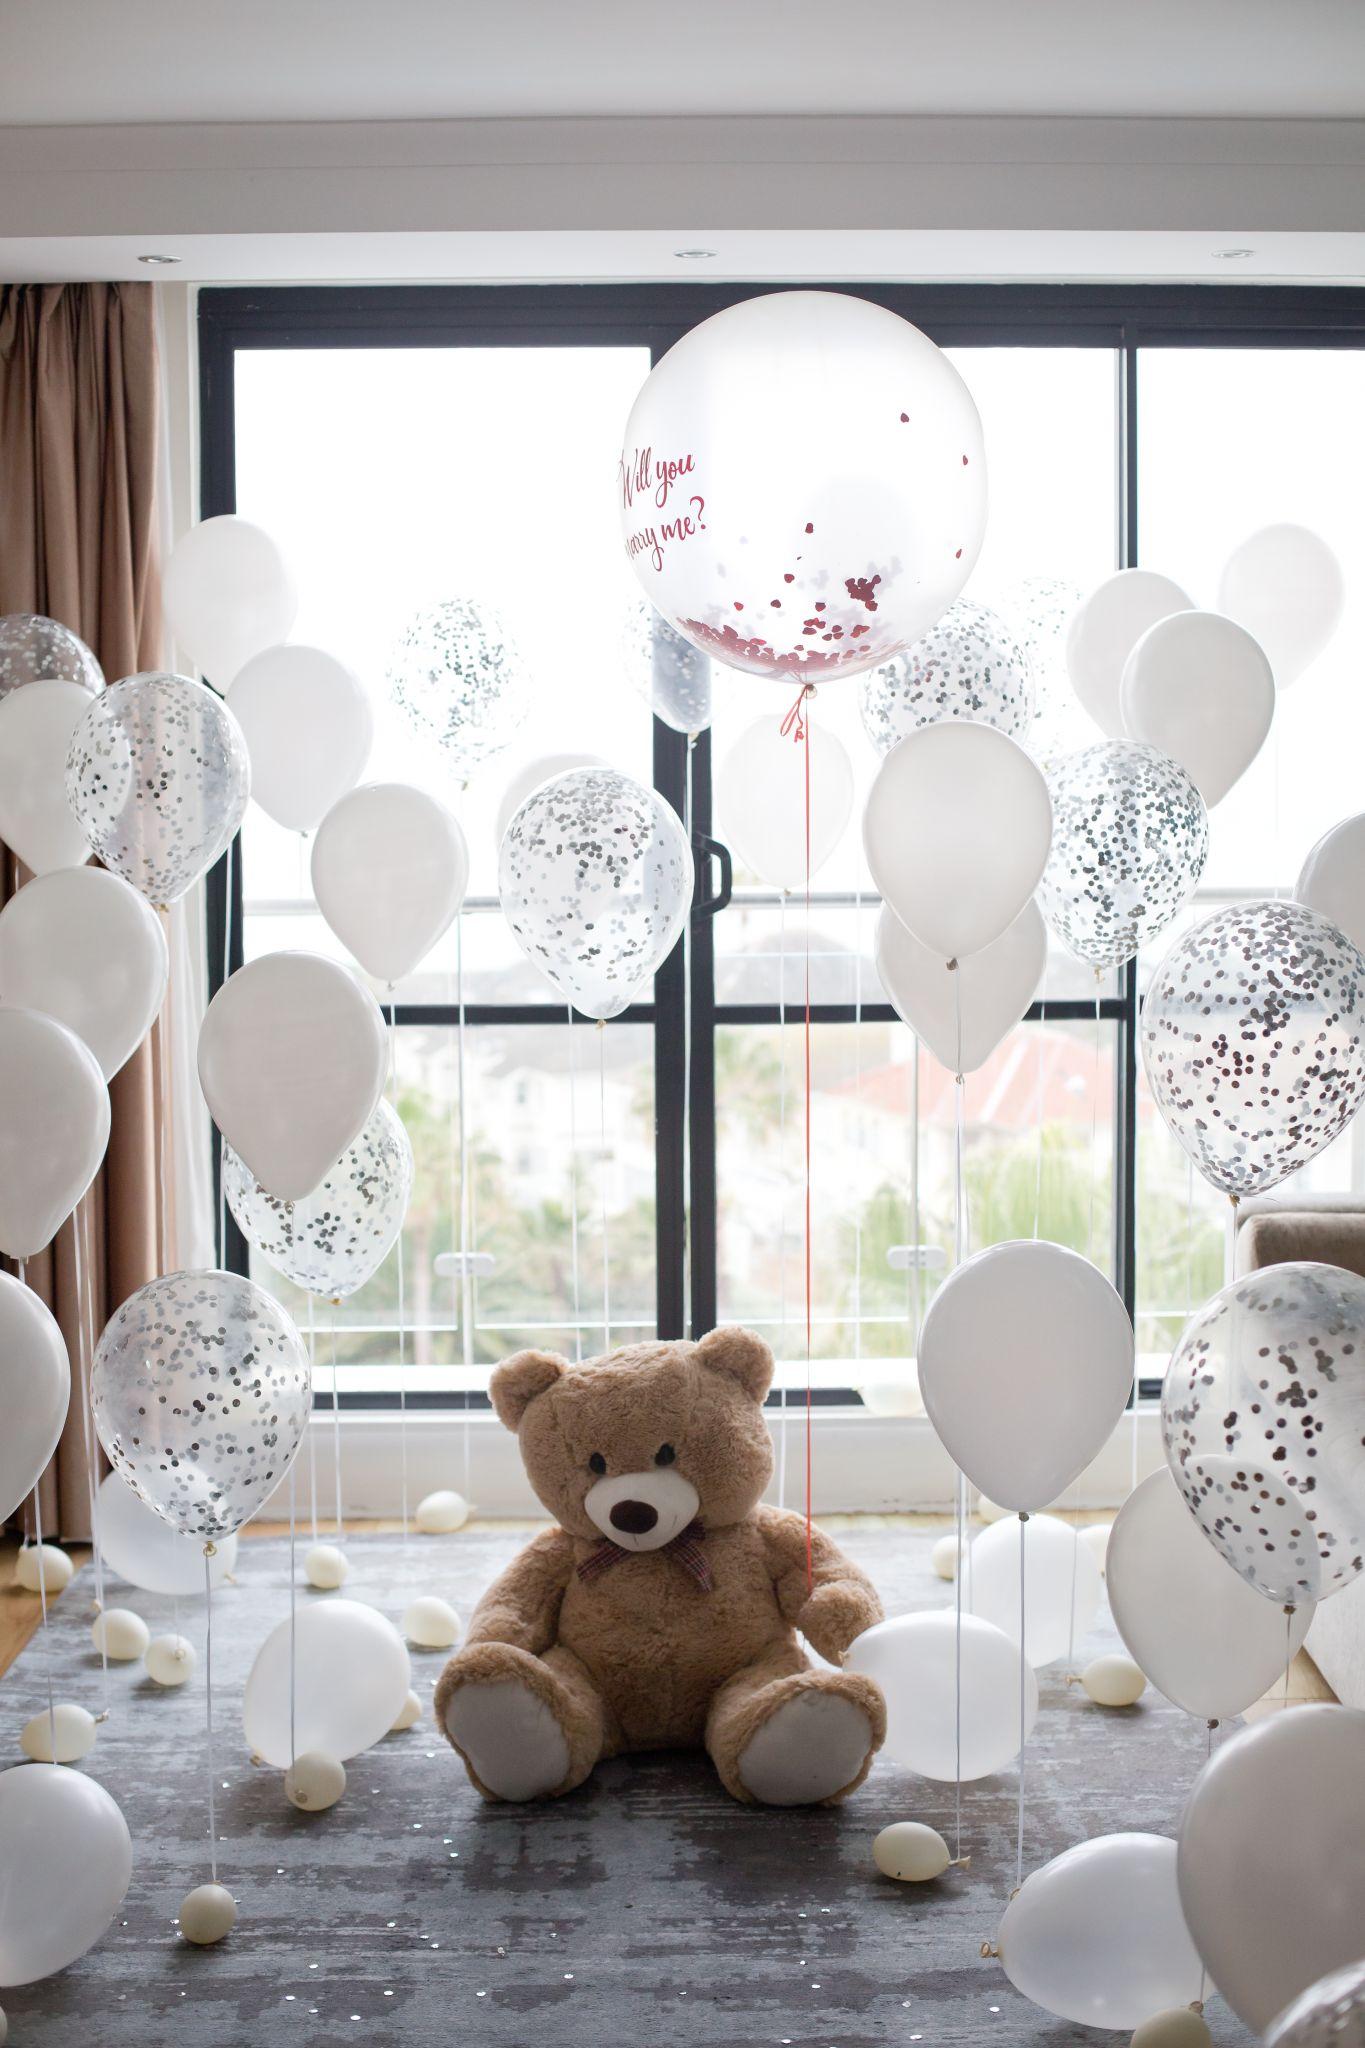 Teddy bear proposal in Cape Town